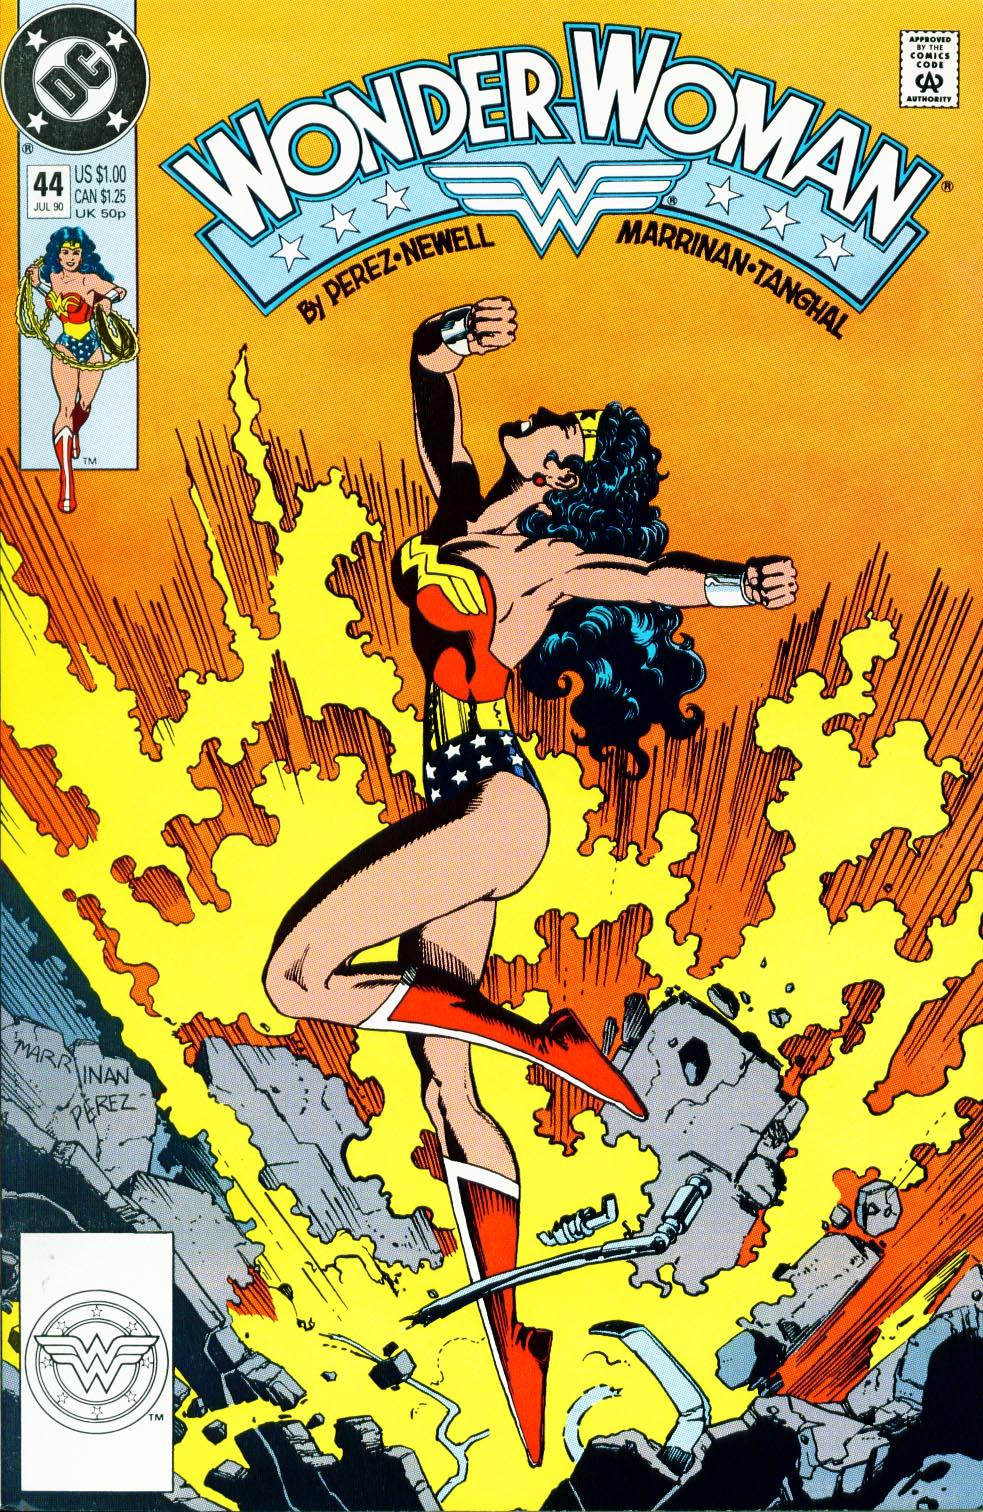 Read online Wonder Woman (1987) comic -  Issue #44 - 2